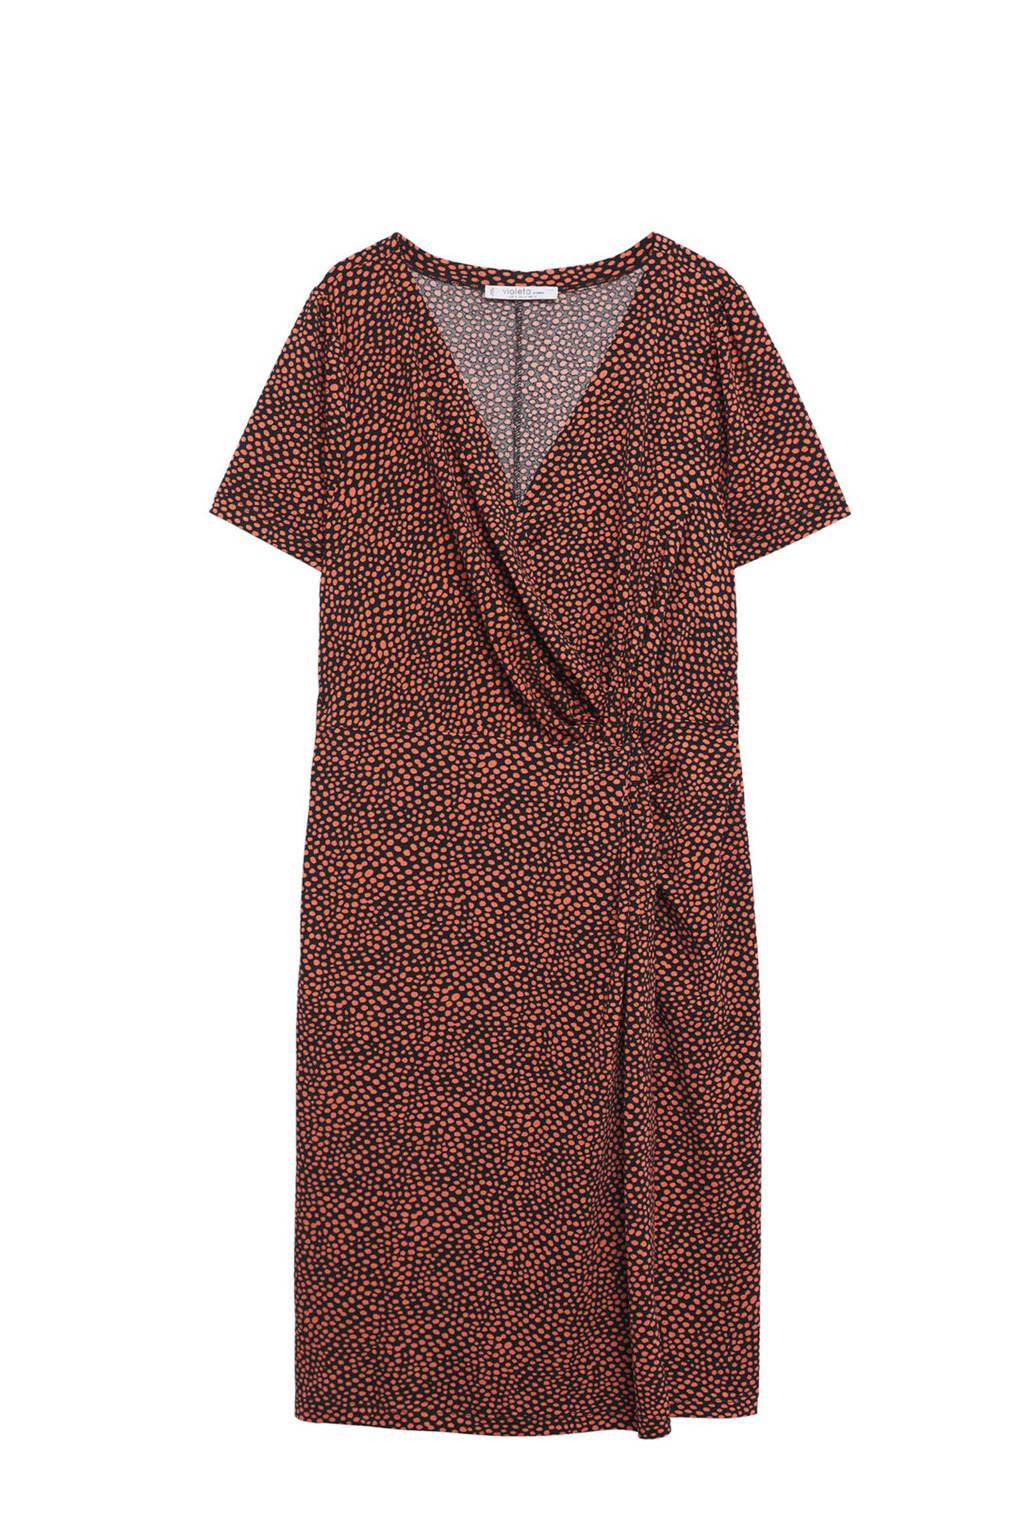 Violeta by Mango jurk met stippen koraalrood, Koraalrood